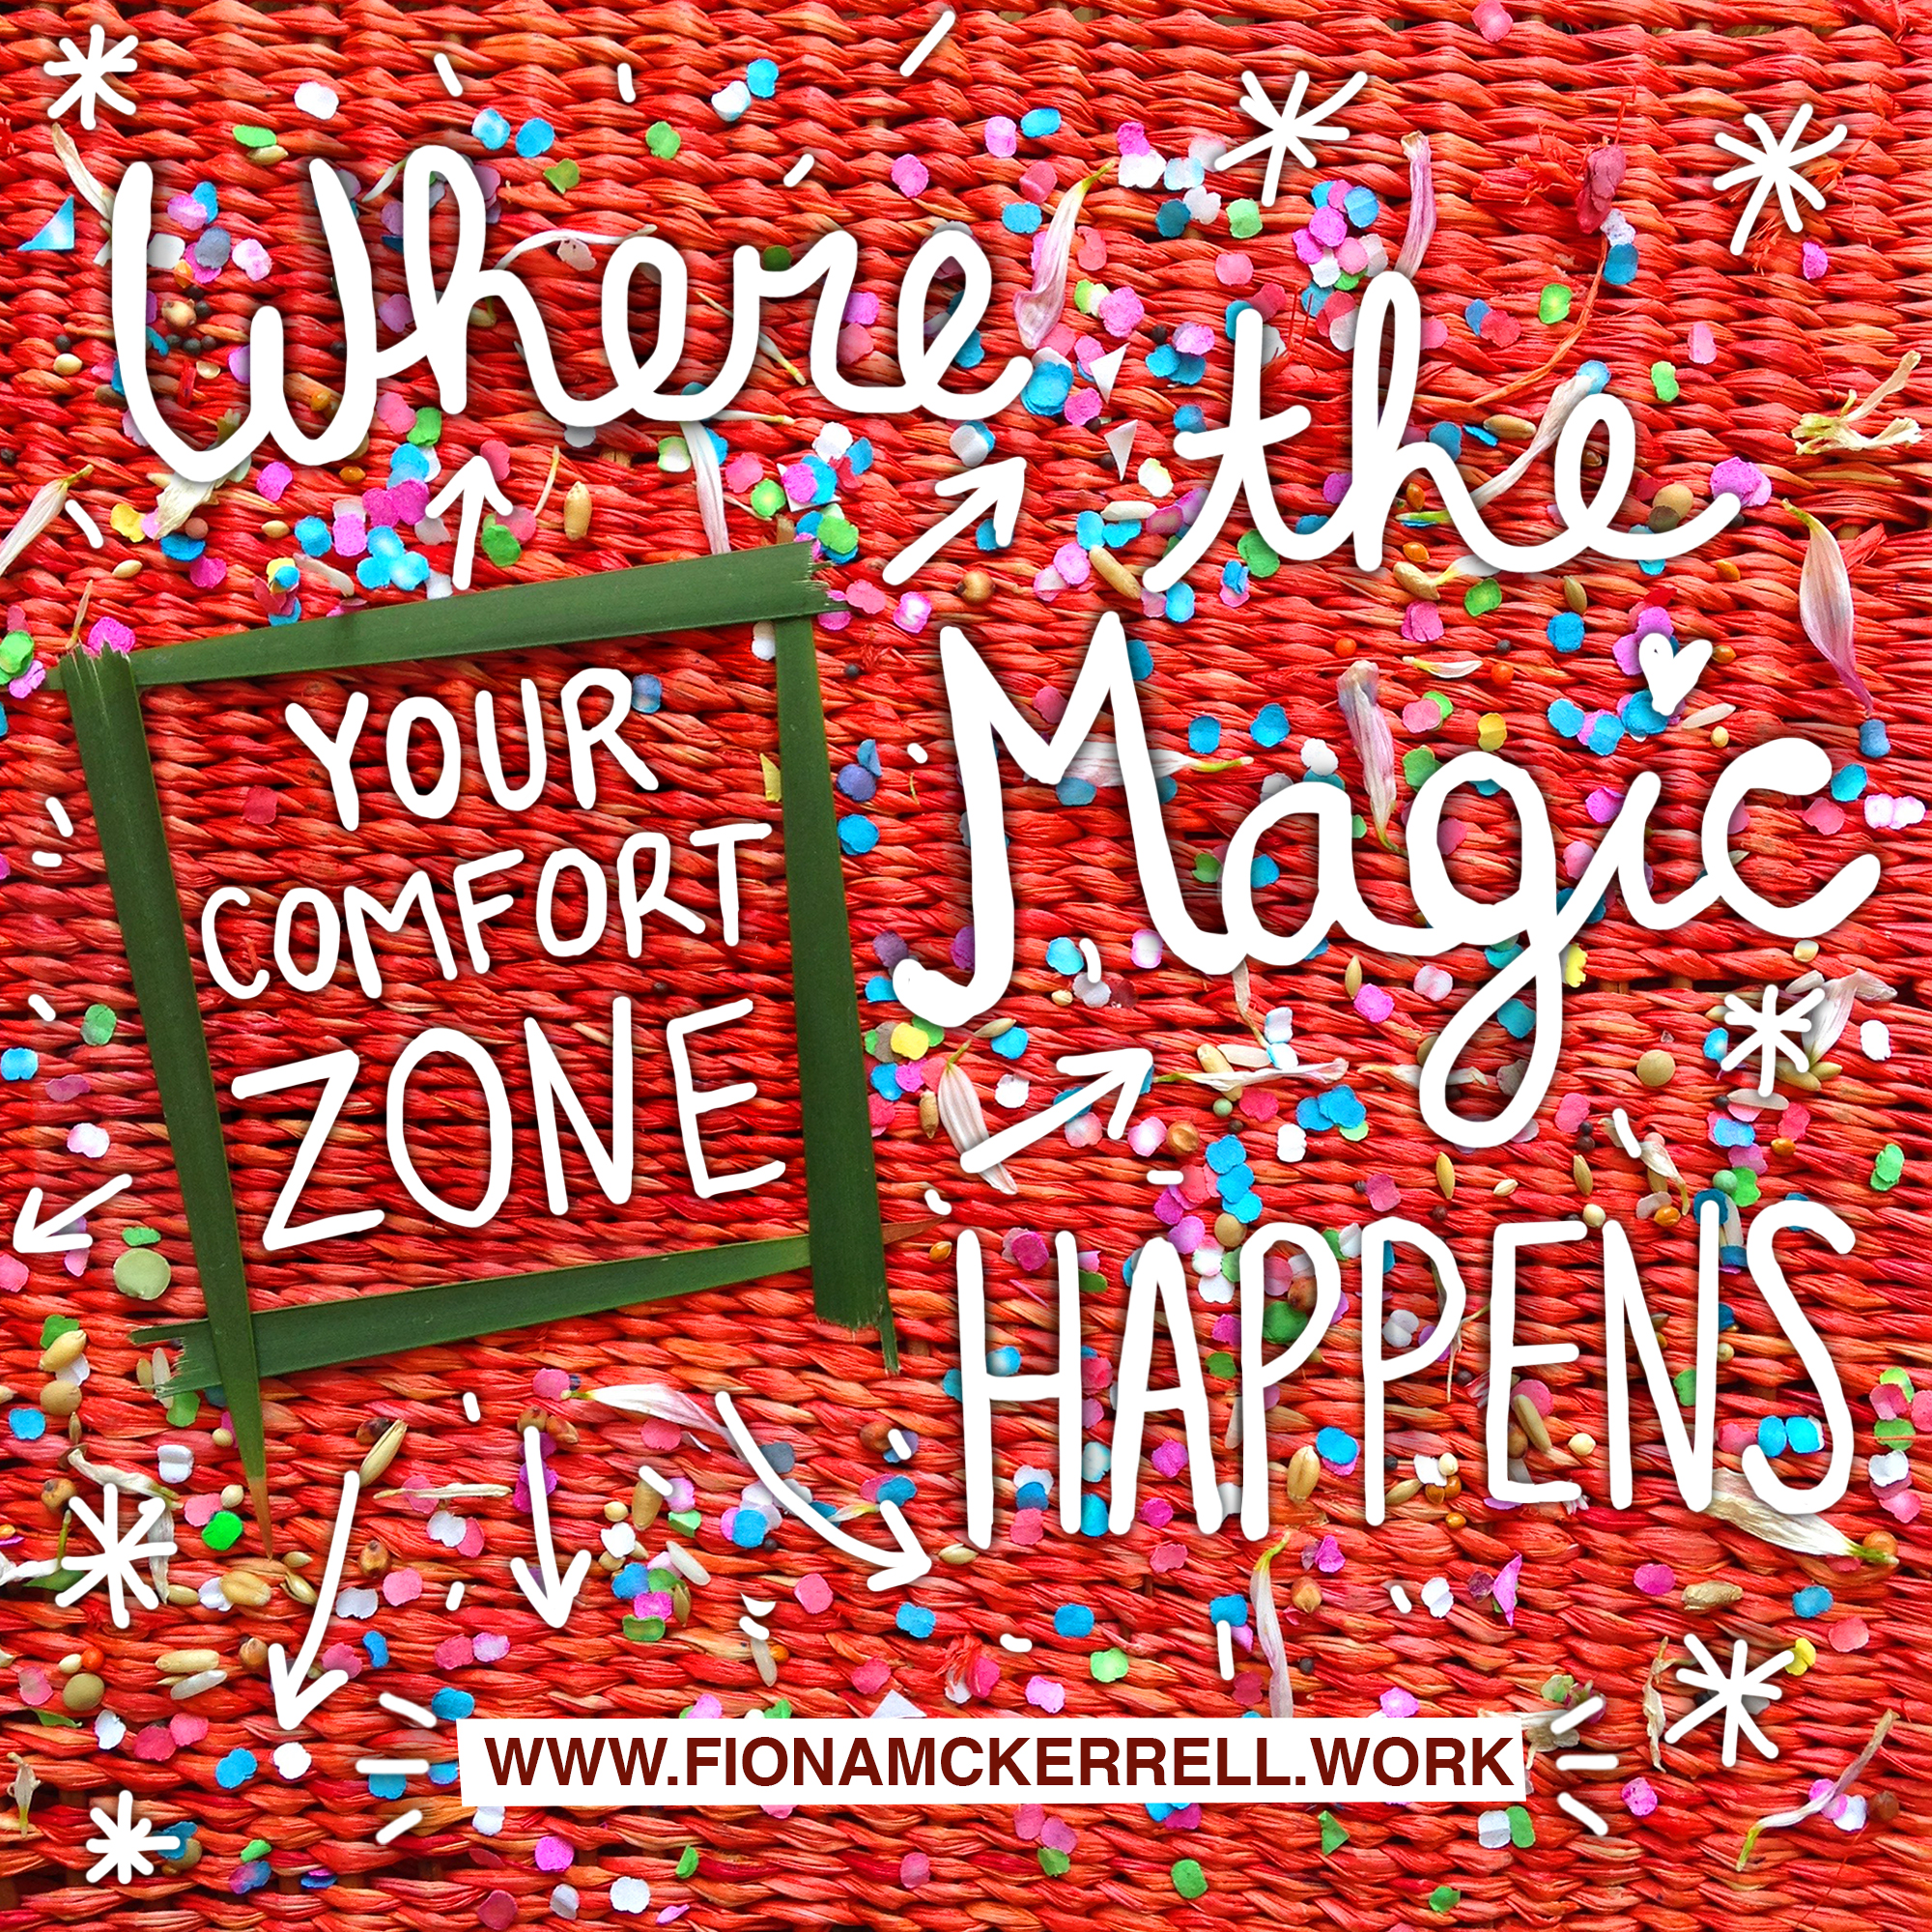 comfort zone magic happens